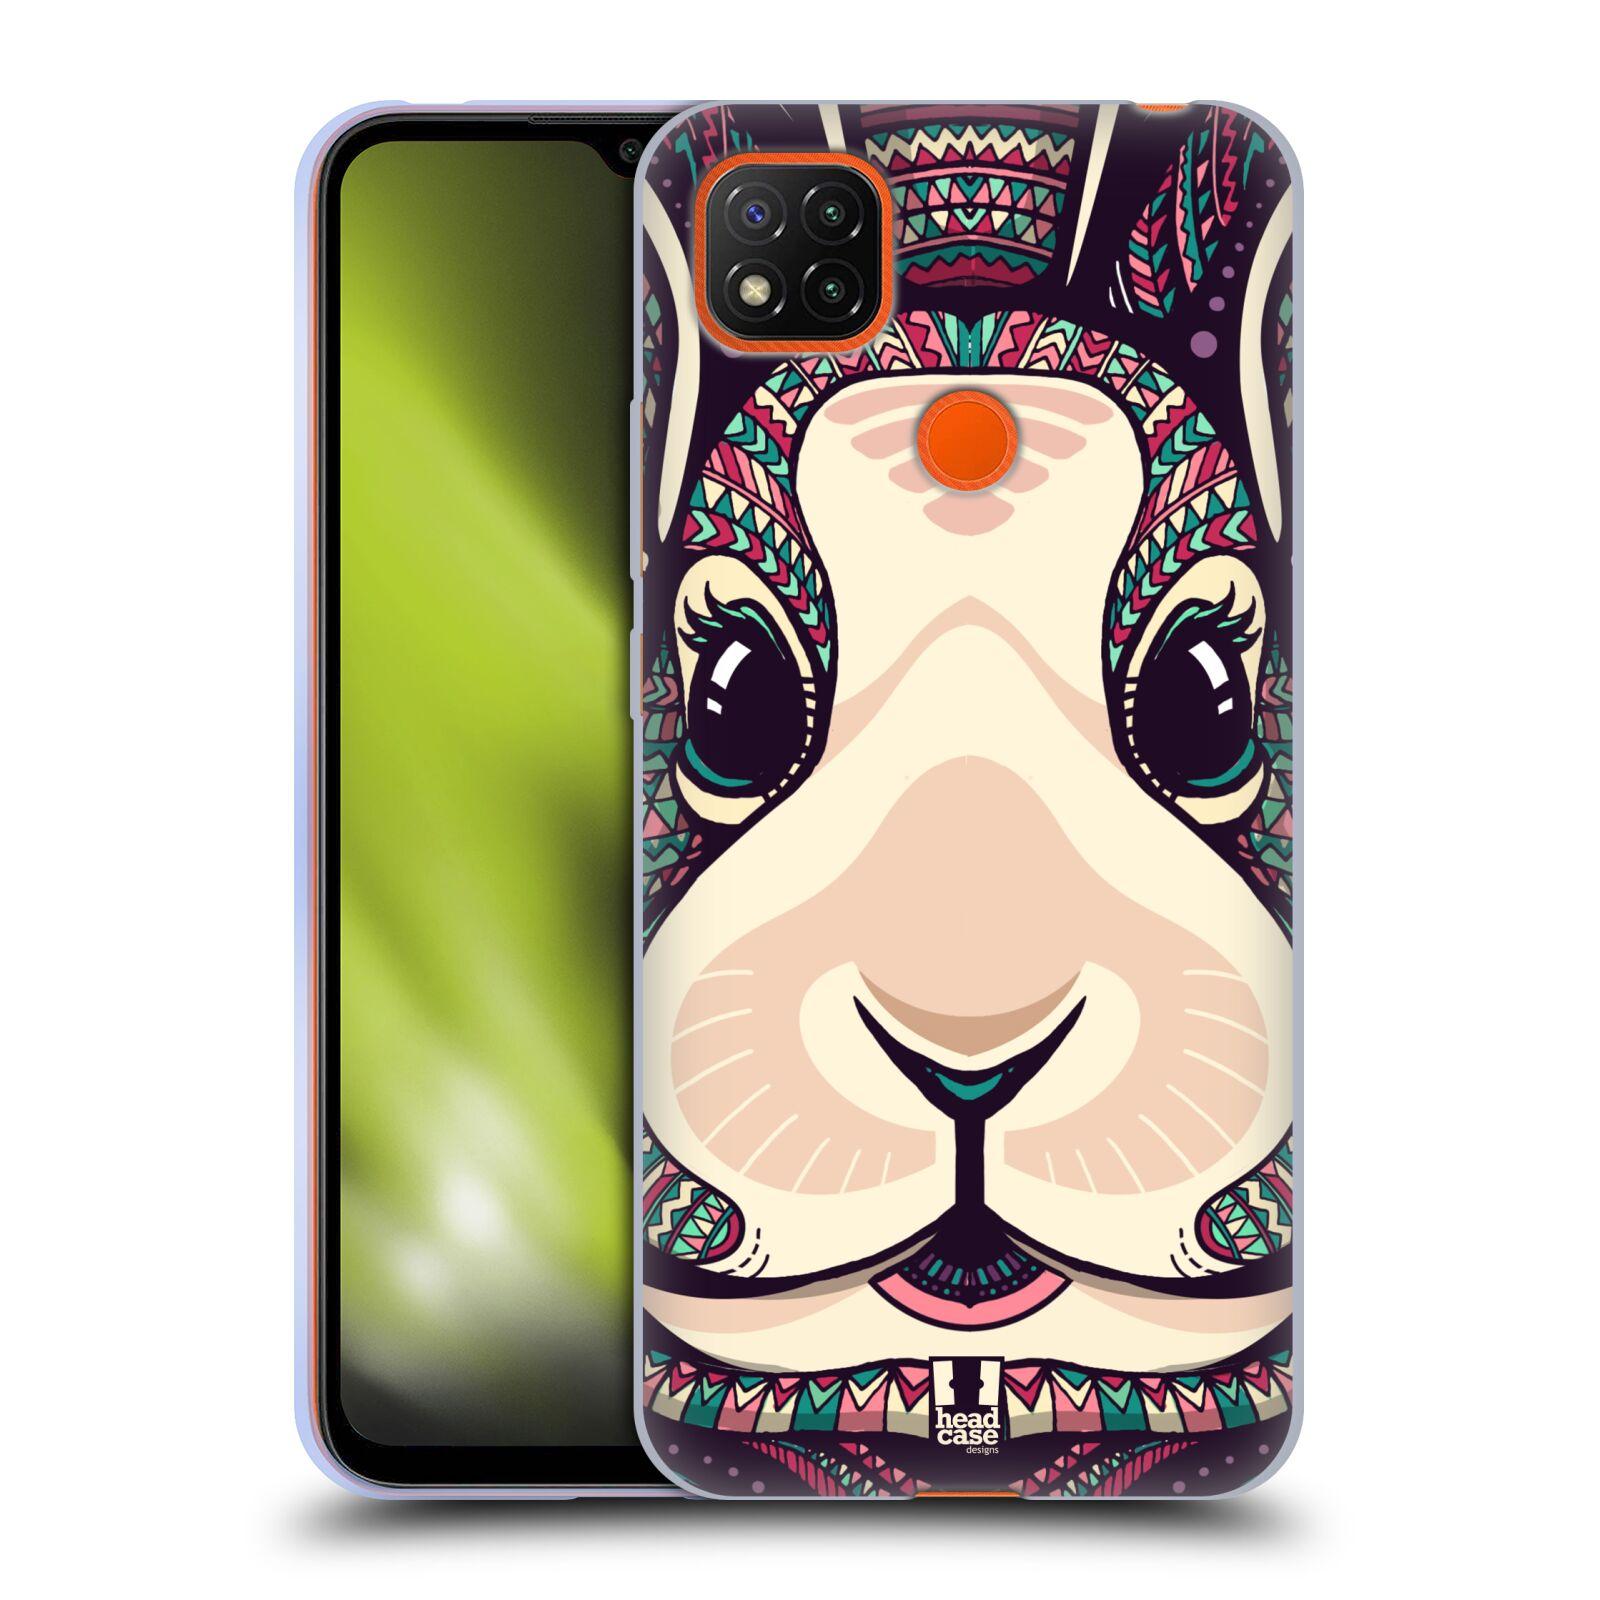 Silikonové pouzdro na mobil Xiaomi Redmi 9C - Head Case - AZTEC ZAJÍČEK